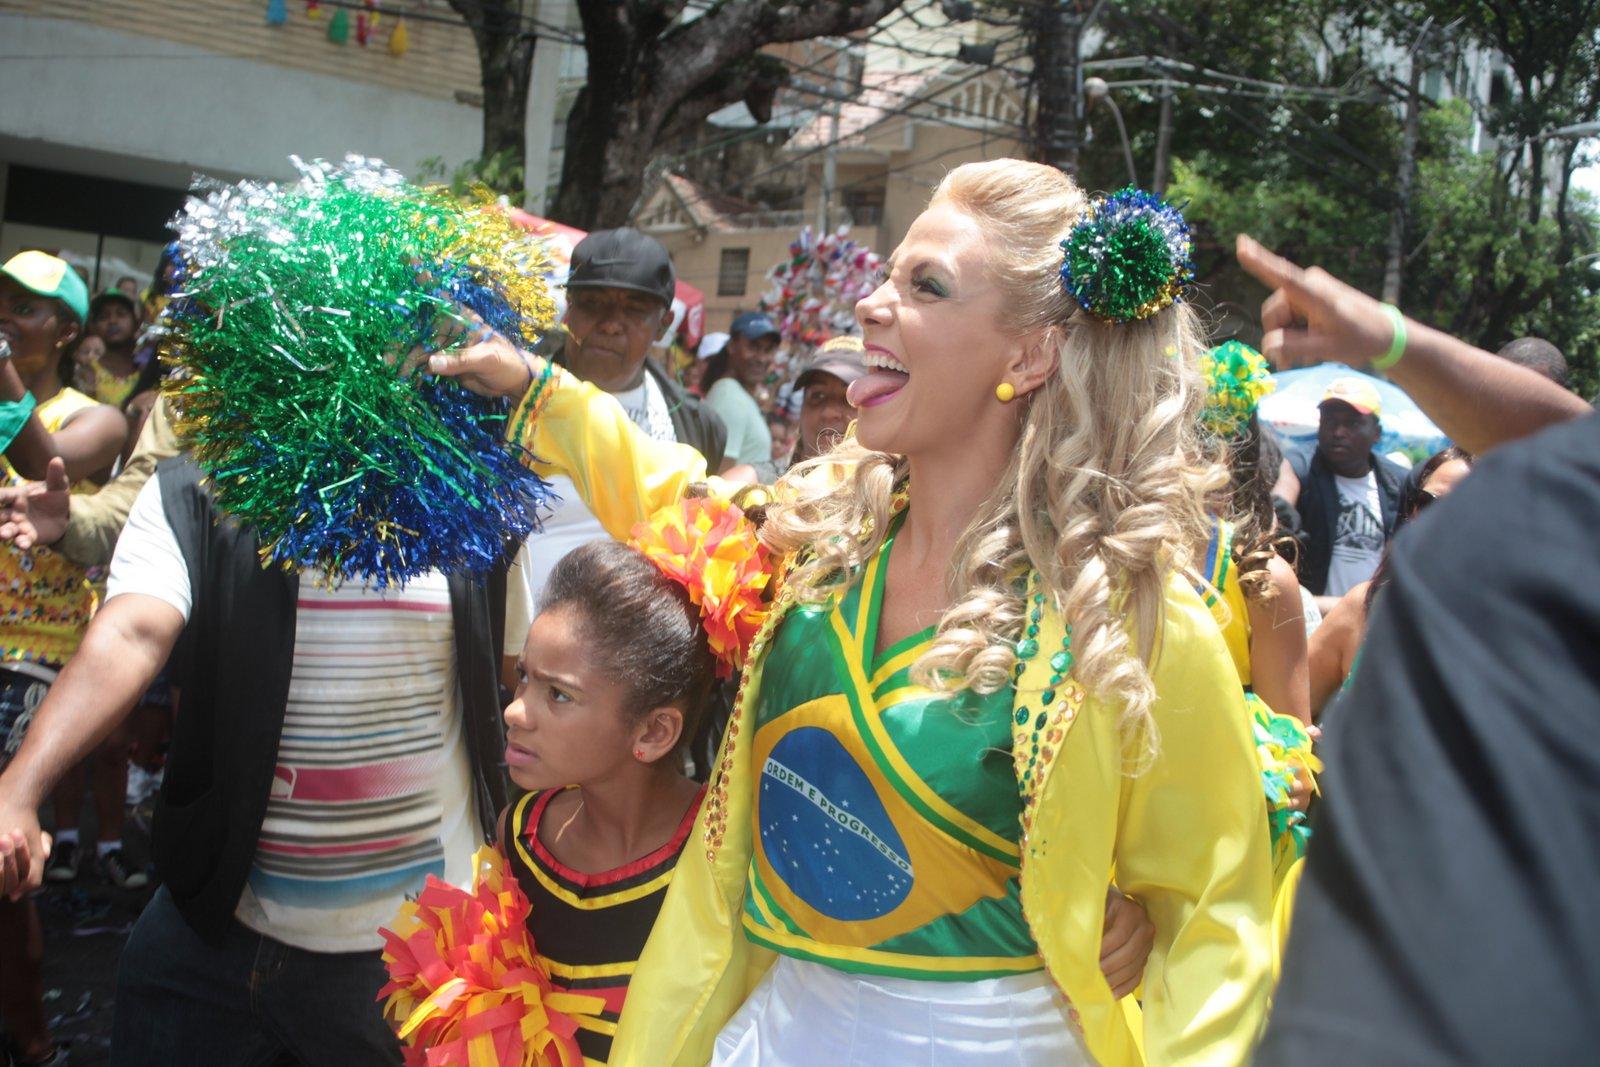 Trio de Carla Perez no carnaval de Salvador, Bahia